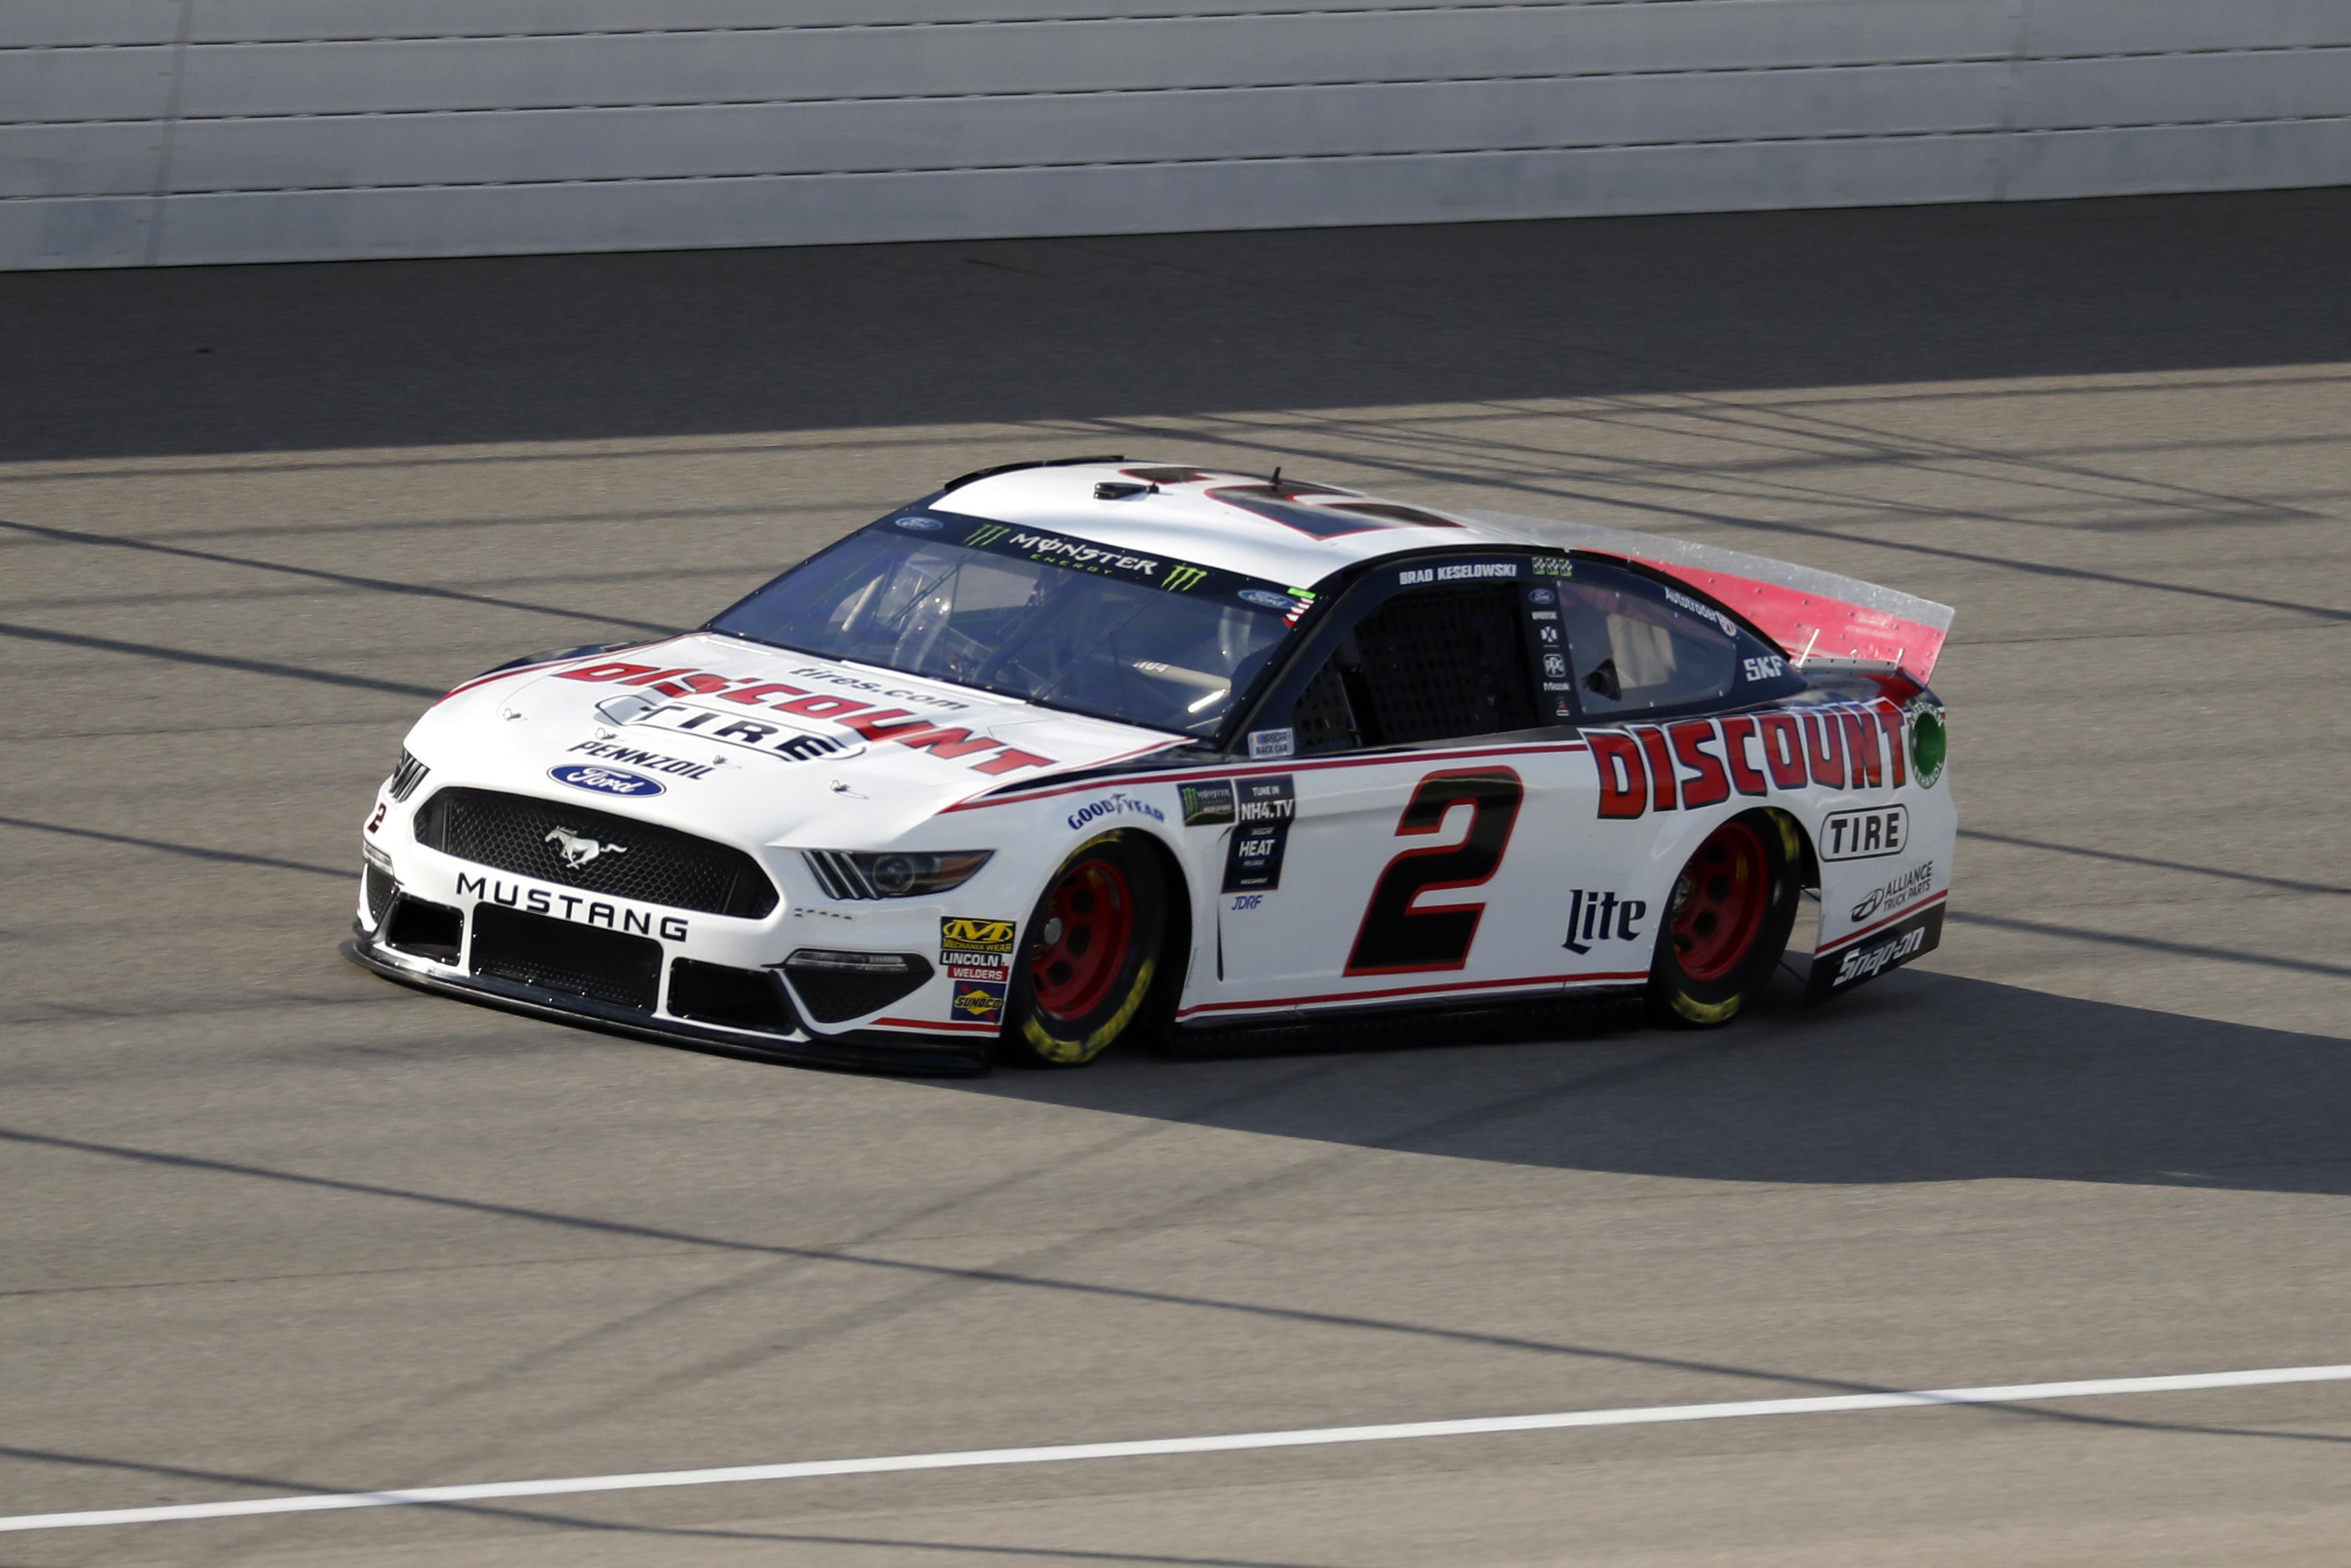 Brad Keselowski wins pole for NASCAR Cup race at Michigan | SWX